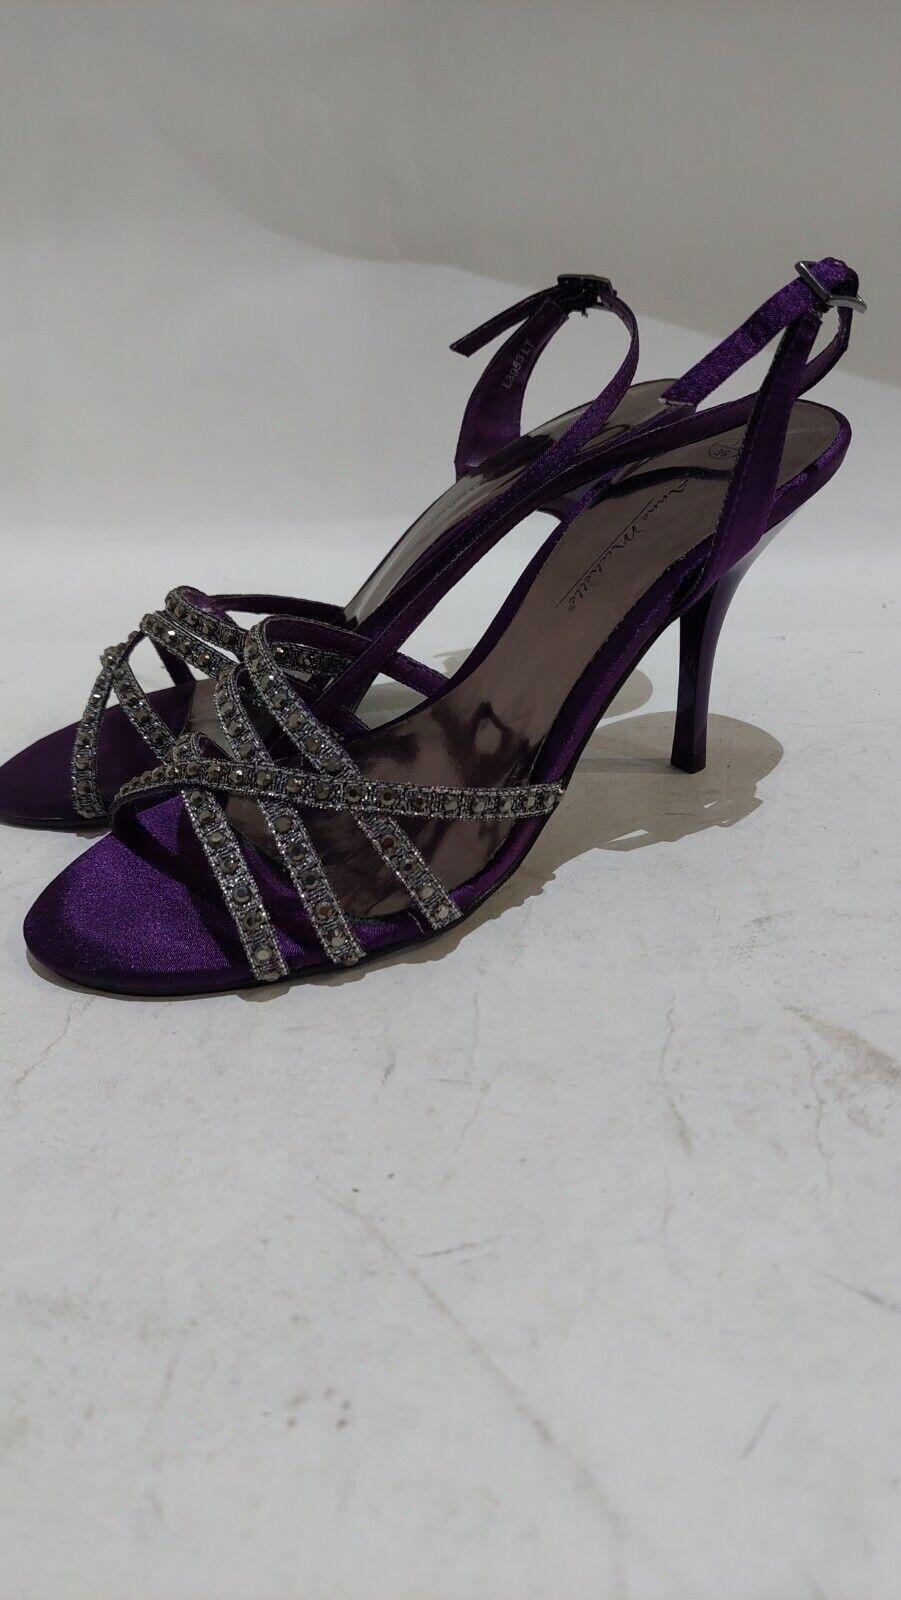 BNIB Purple Sparkly Shoes size 3 #544